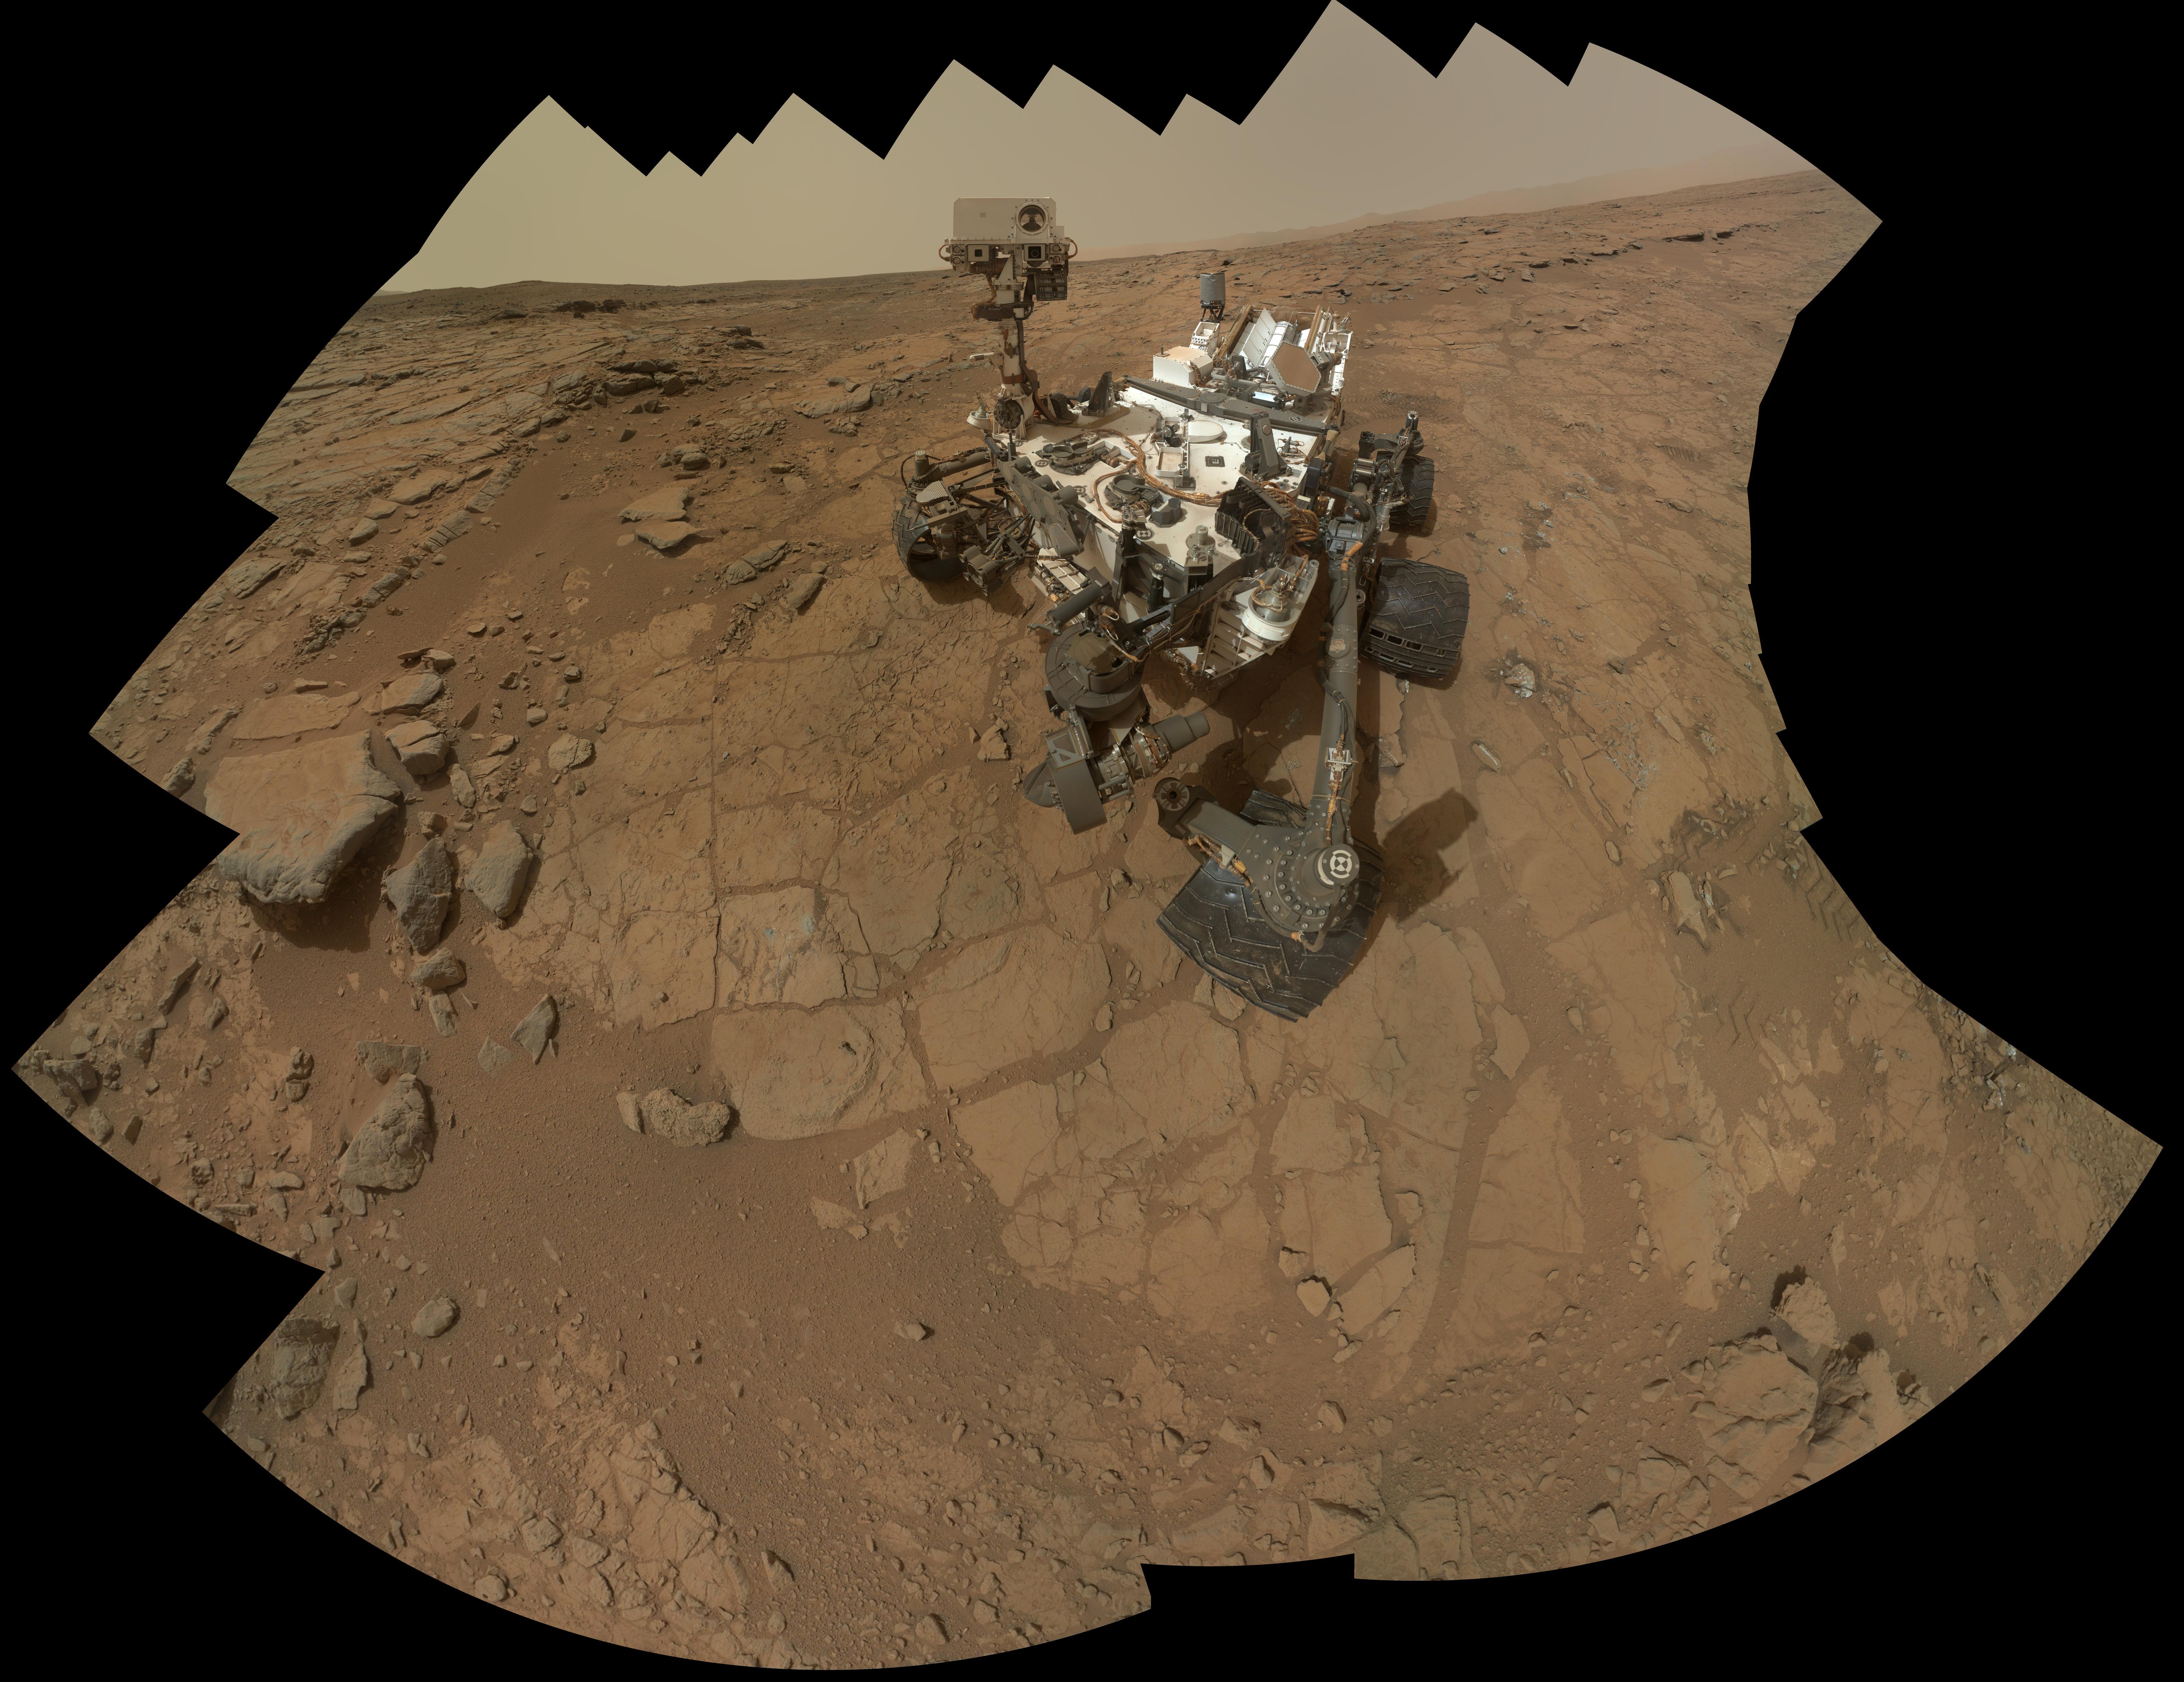 mars curiosity rover live feed - photo #26